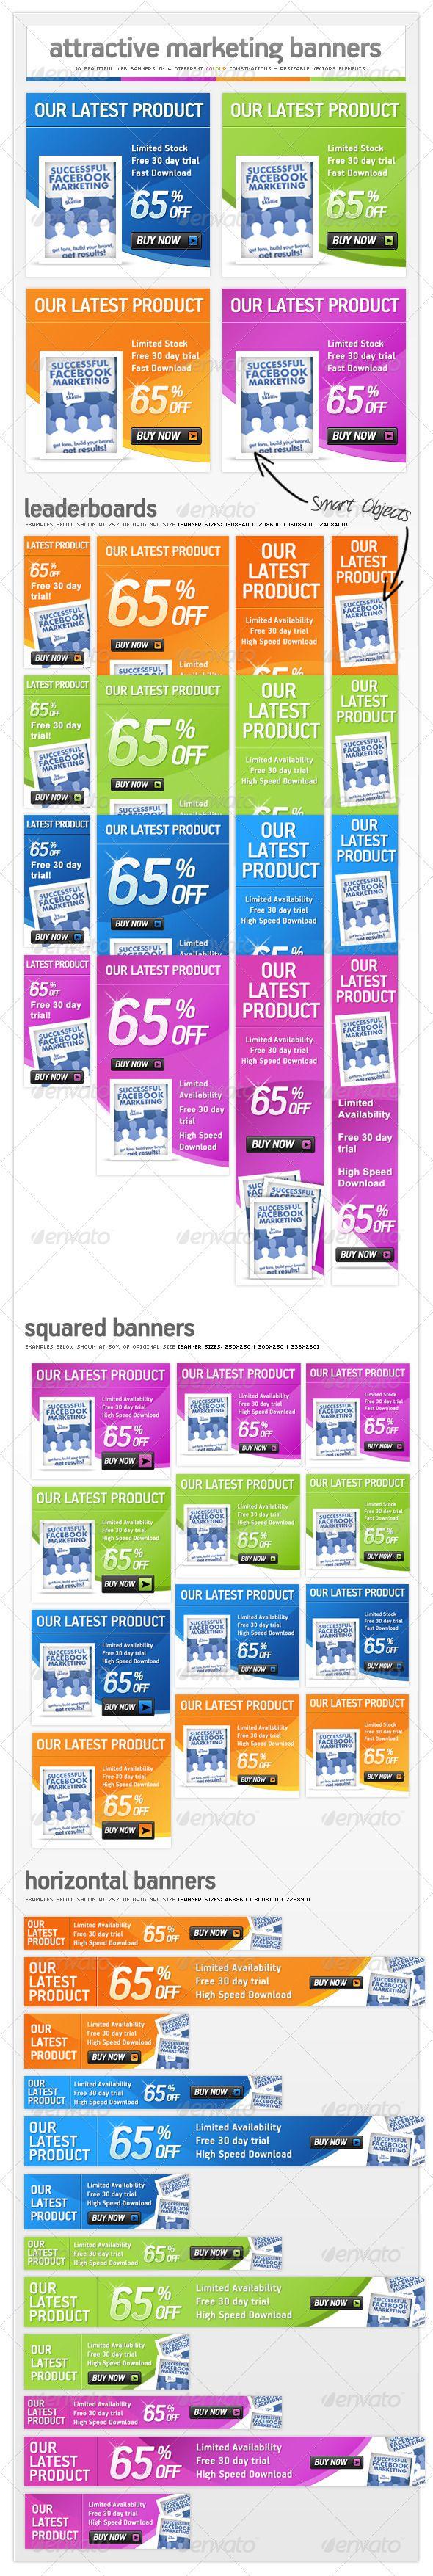 Online Marketing Pack - Web Banner Ads  http://www.elegantthemes.com/gallery/styleshop/